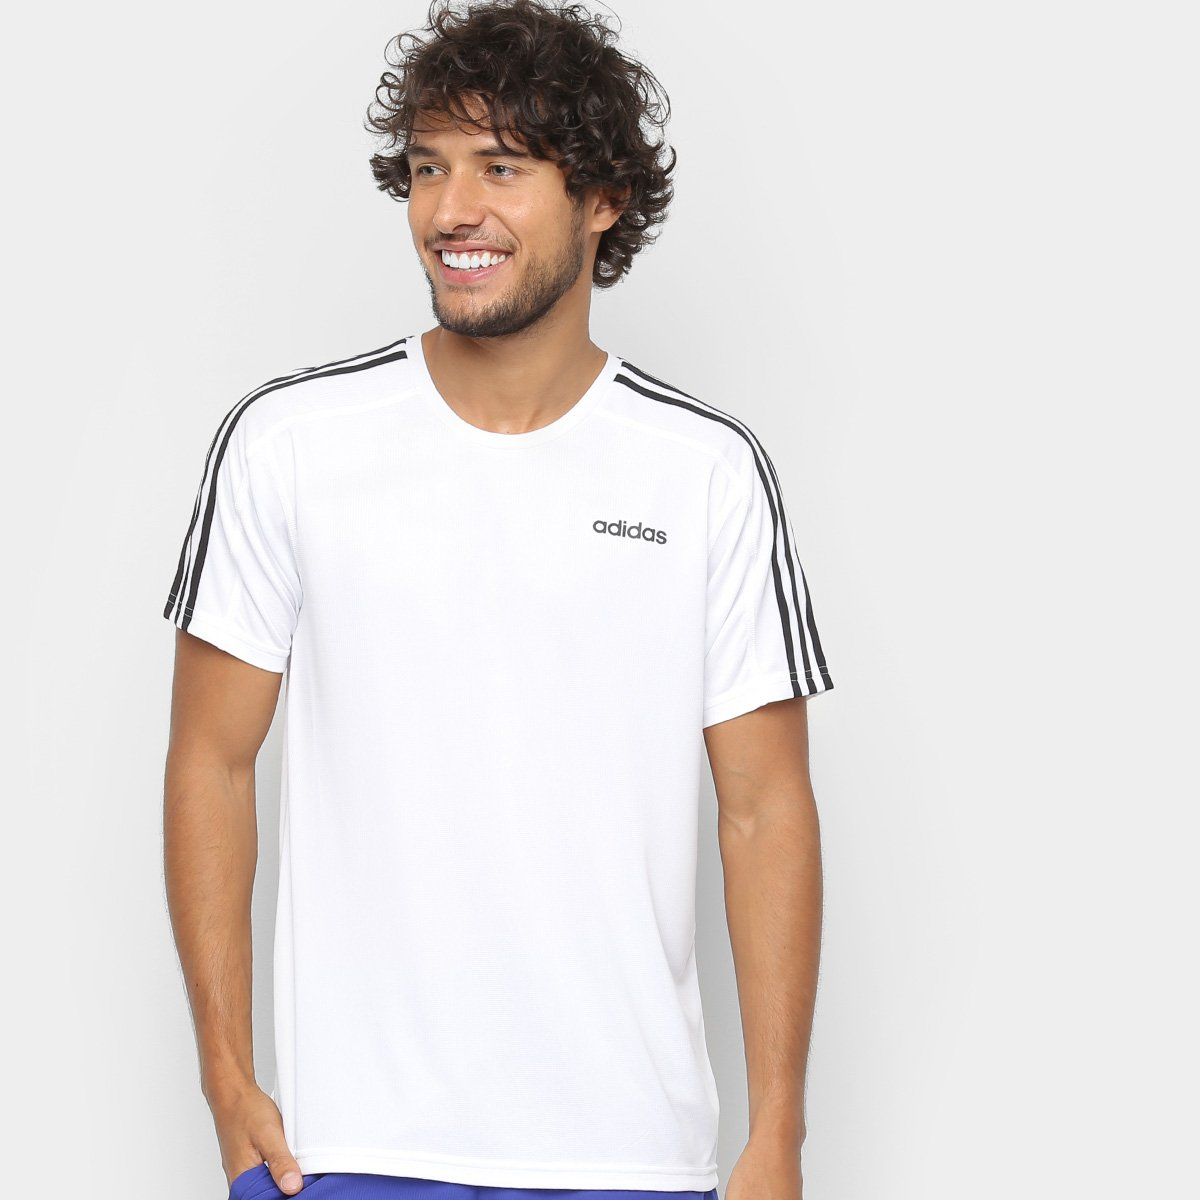 dc2802b33f9 Camiseta Adidas Design 2 Move 3 Stripes Masculina